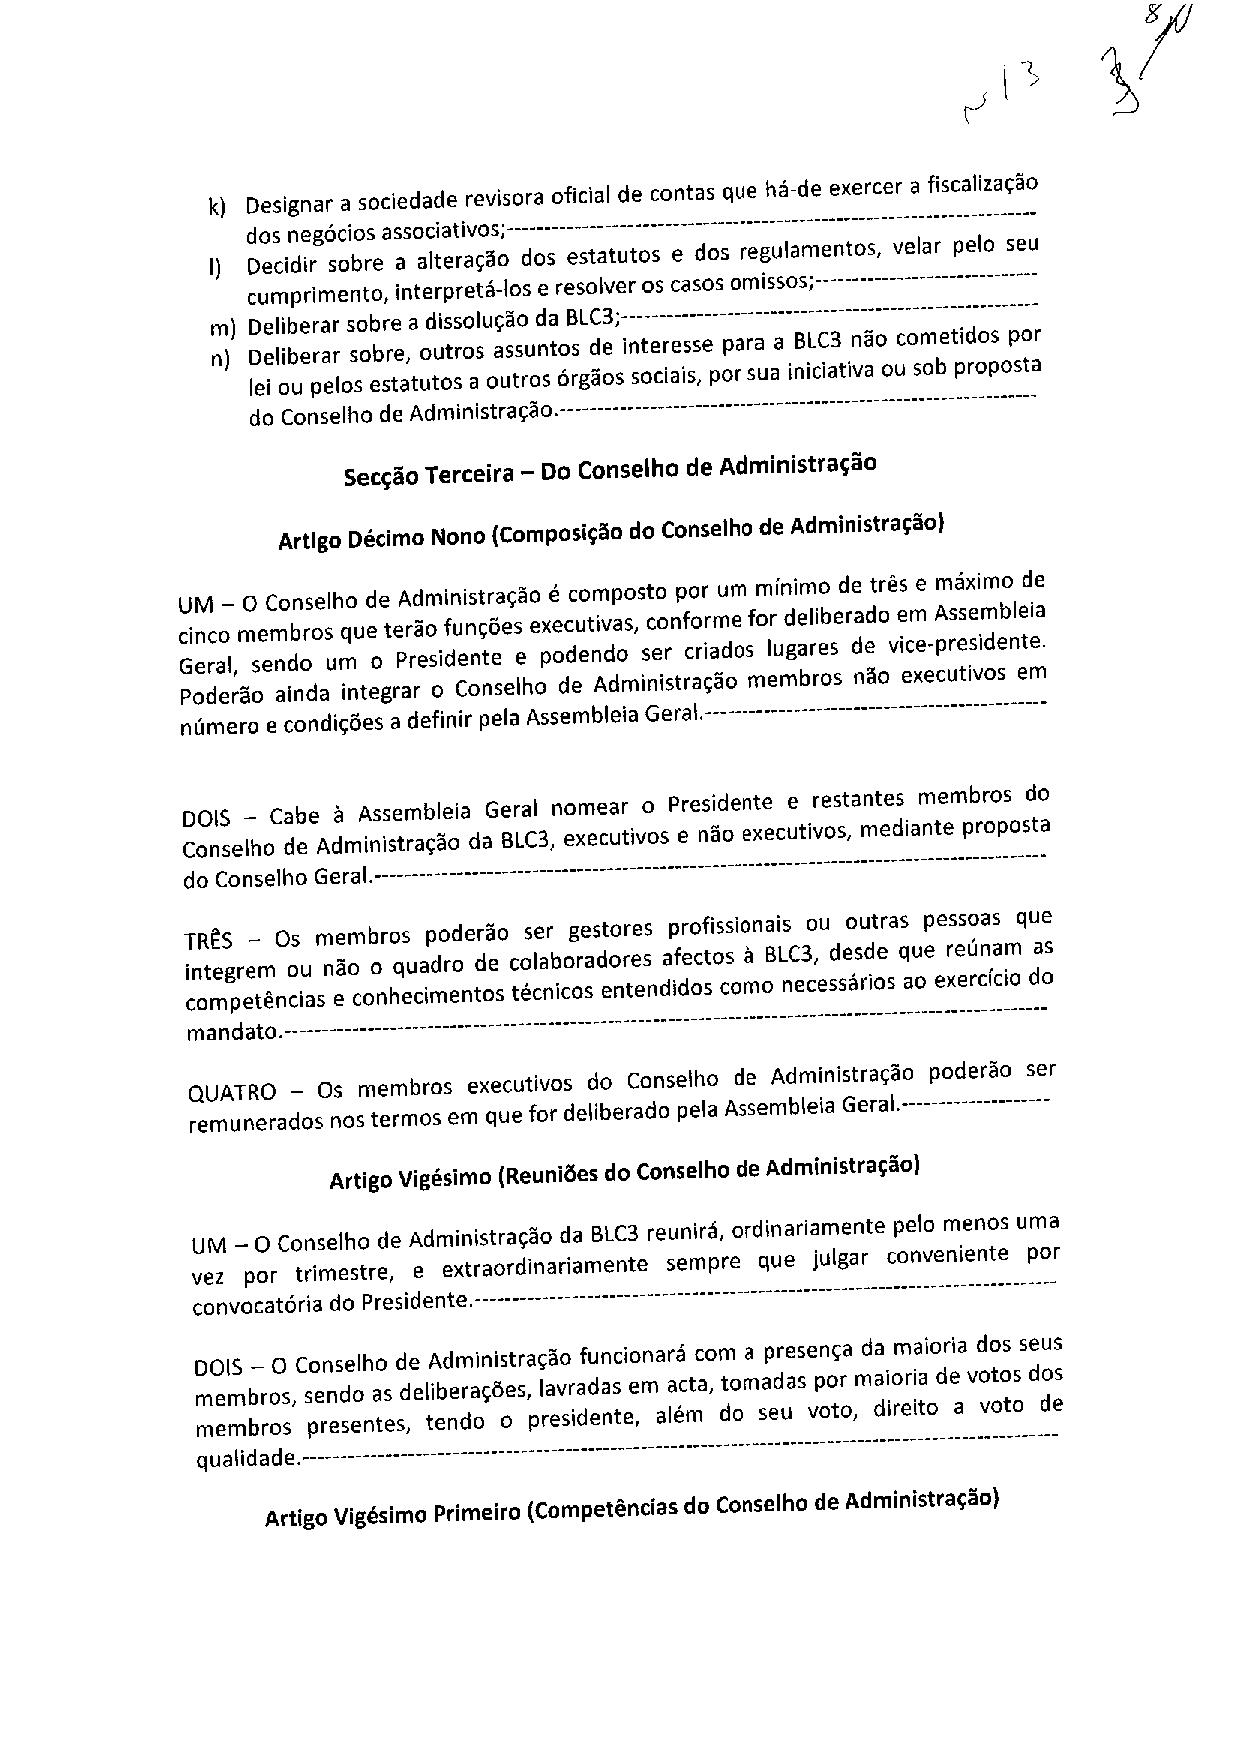 509402267_Associacao_BLC_3a_alteracao (1)-page-014